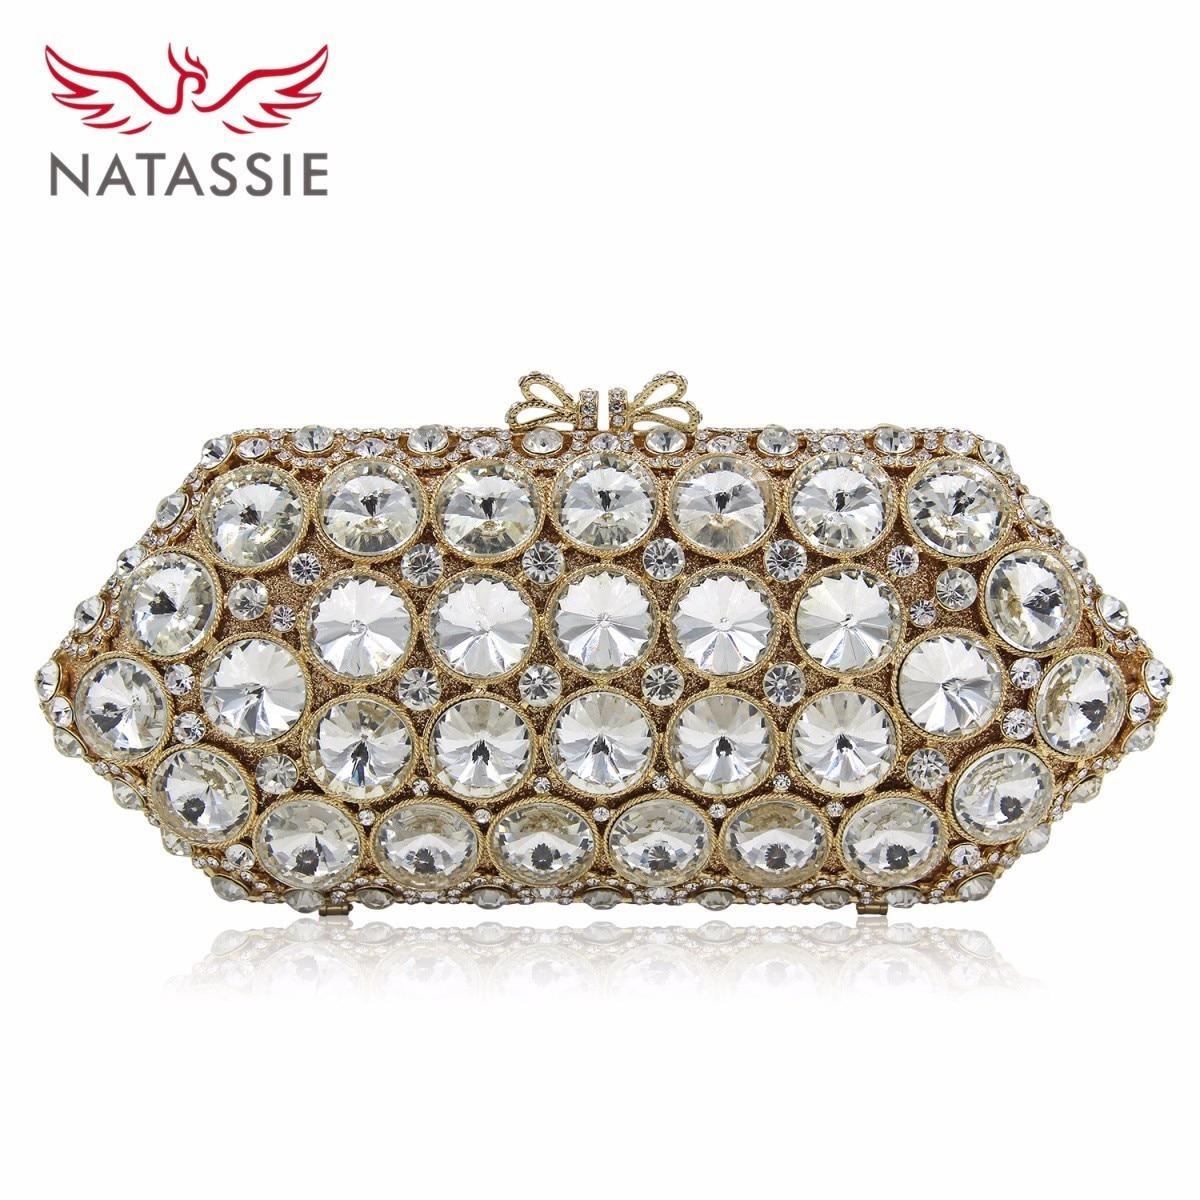 NATASSIE Women Crystal Bag White Stone Wedding Party Clutch Bags Shoulder Long Chain Handbag Gold